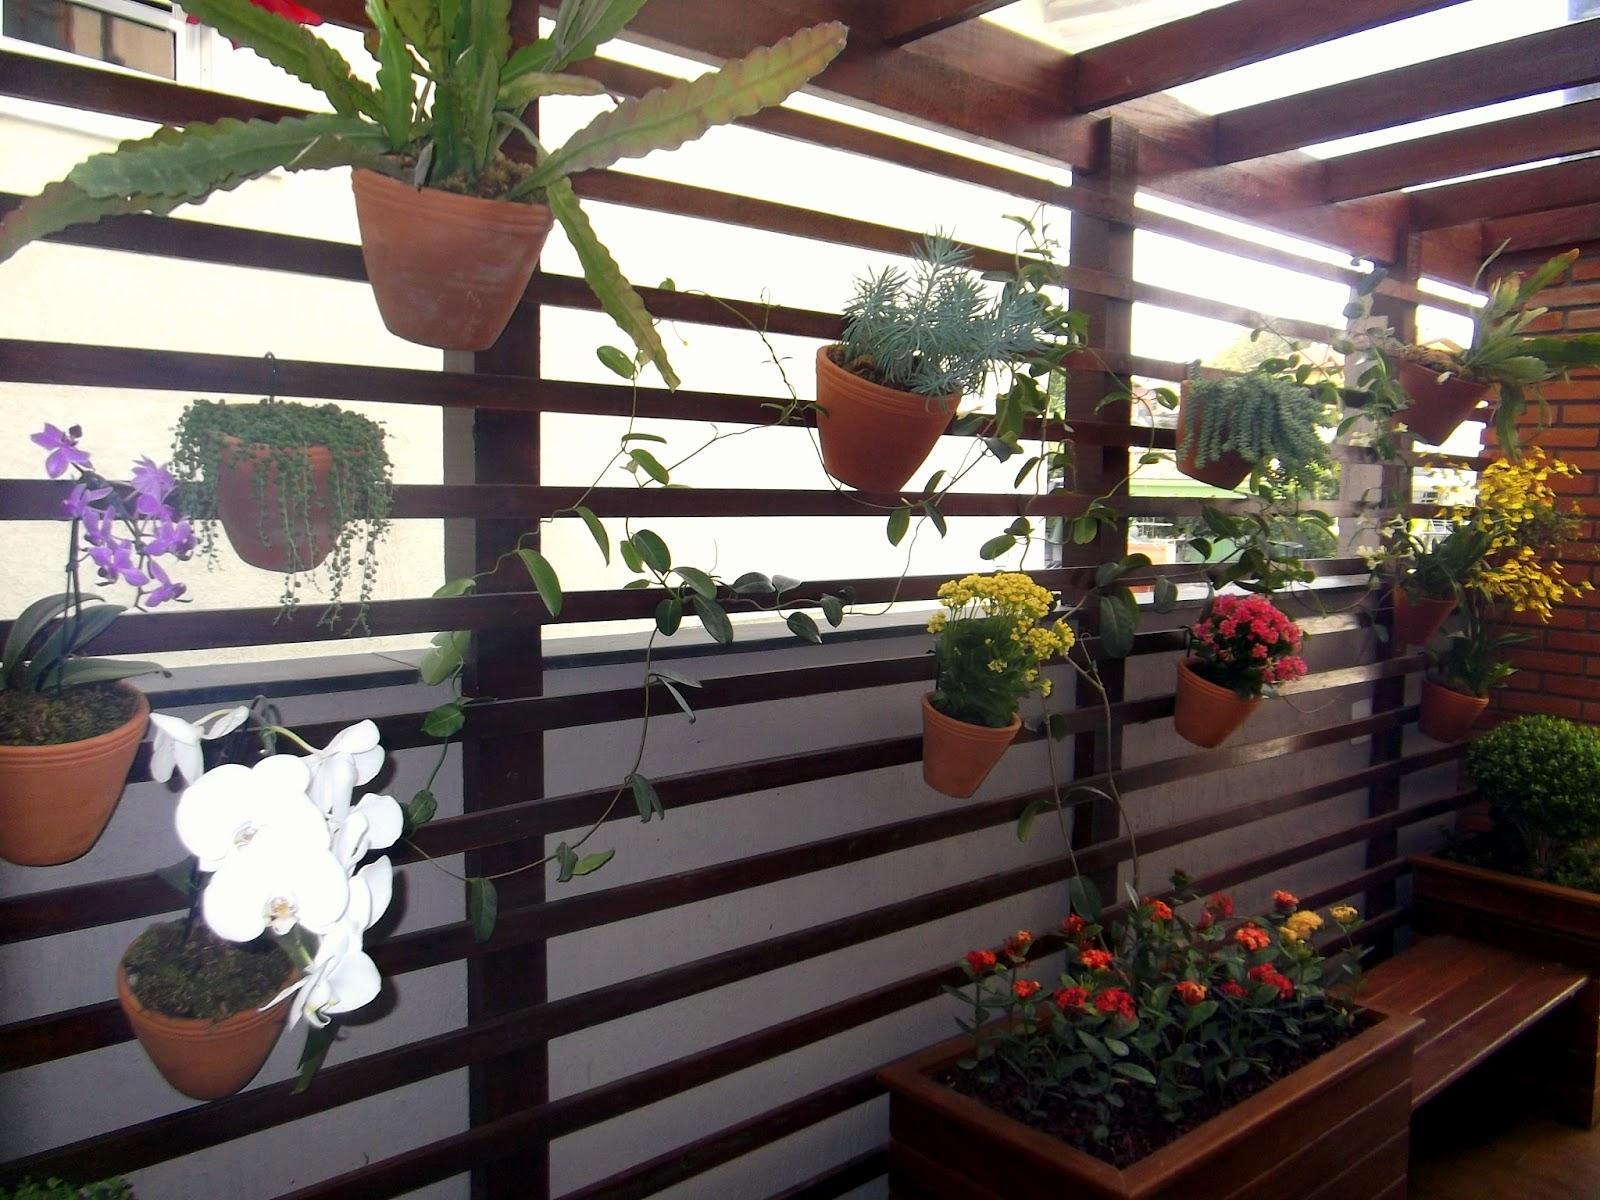 Locais para cultivar orquídeas #837D48 1600x1200